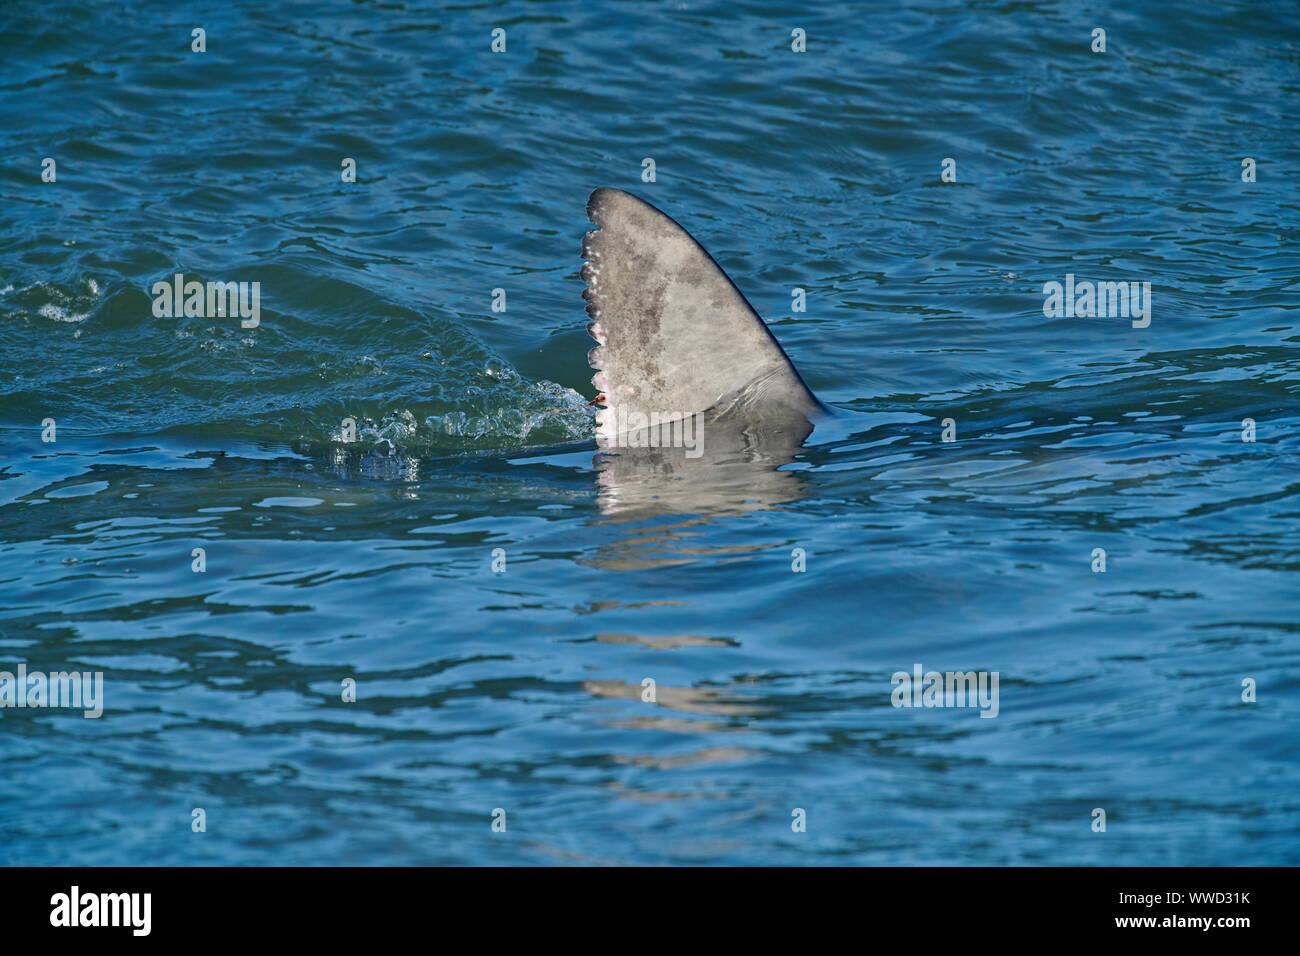 Blue Shark (Prionace glauca) in surf close to beach, Cherry Hill Beach, Nova Scotia, Canada Stock Photo